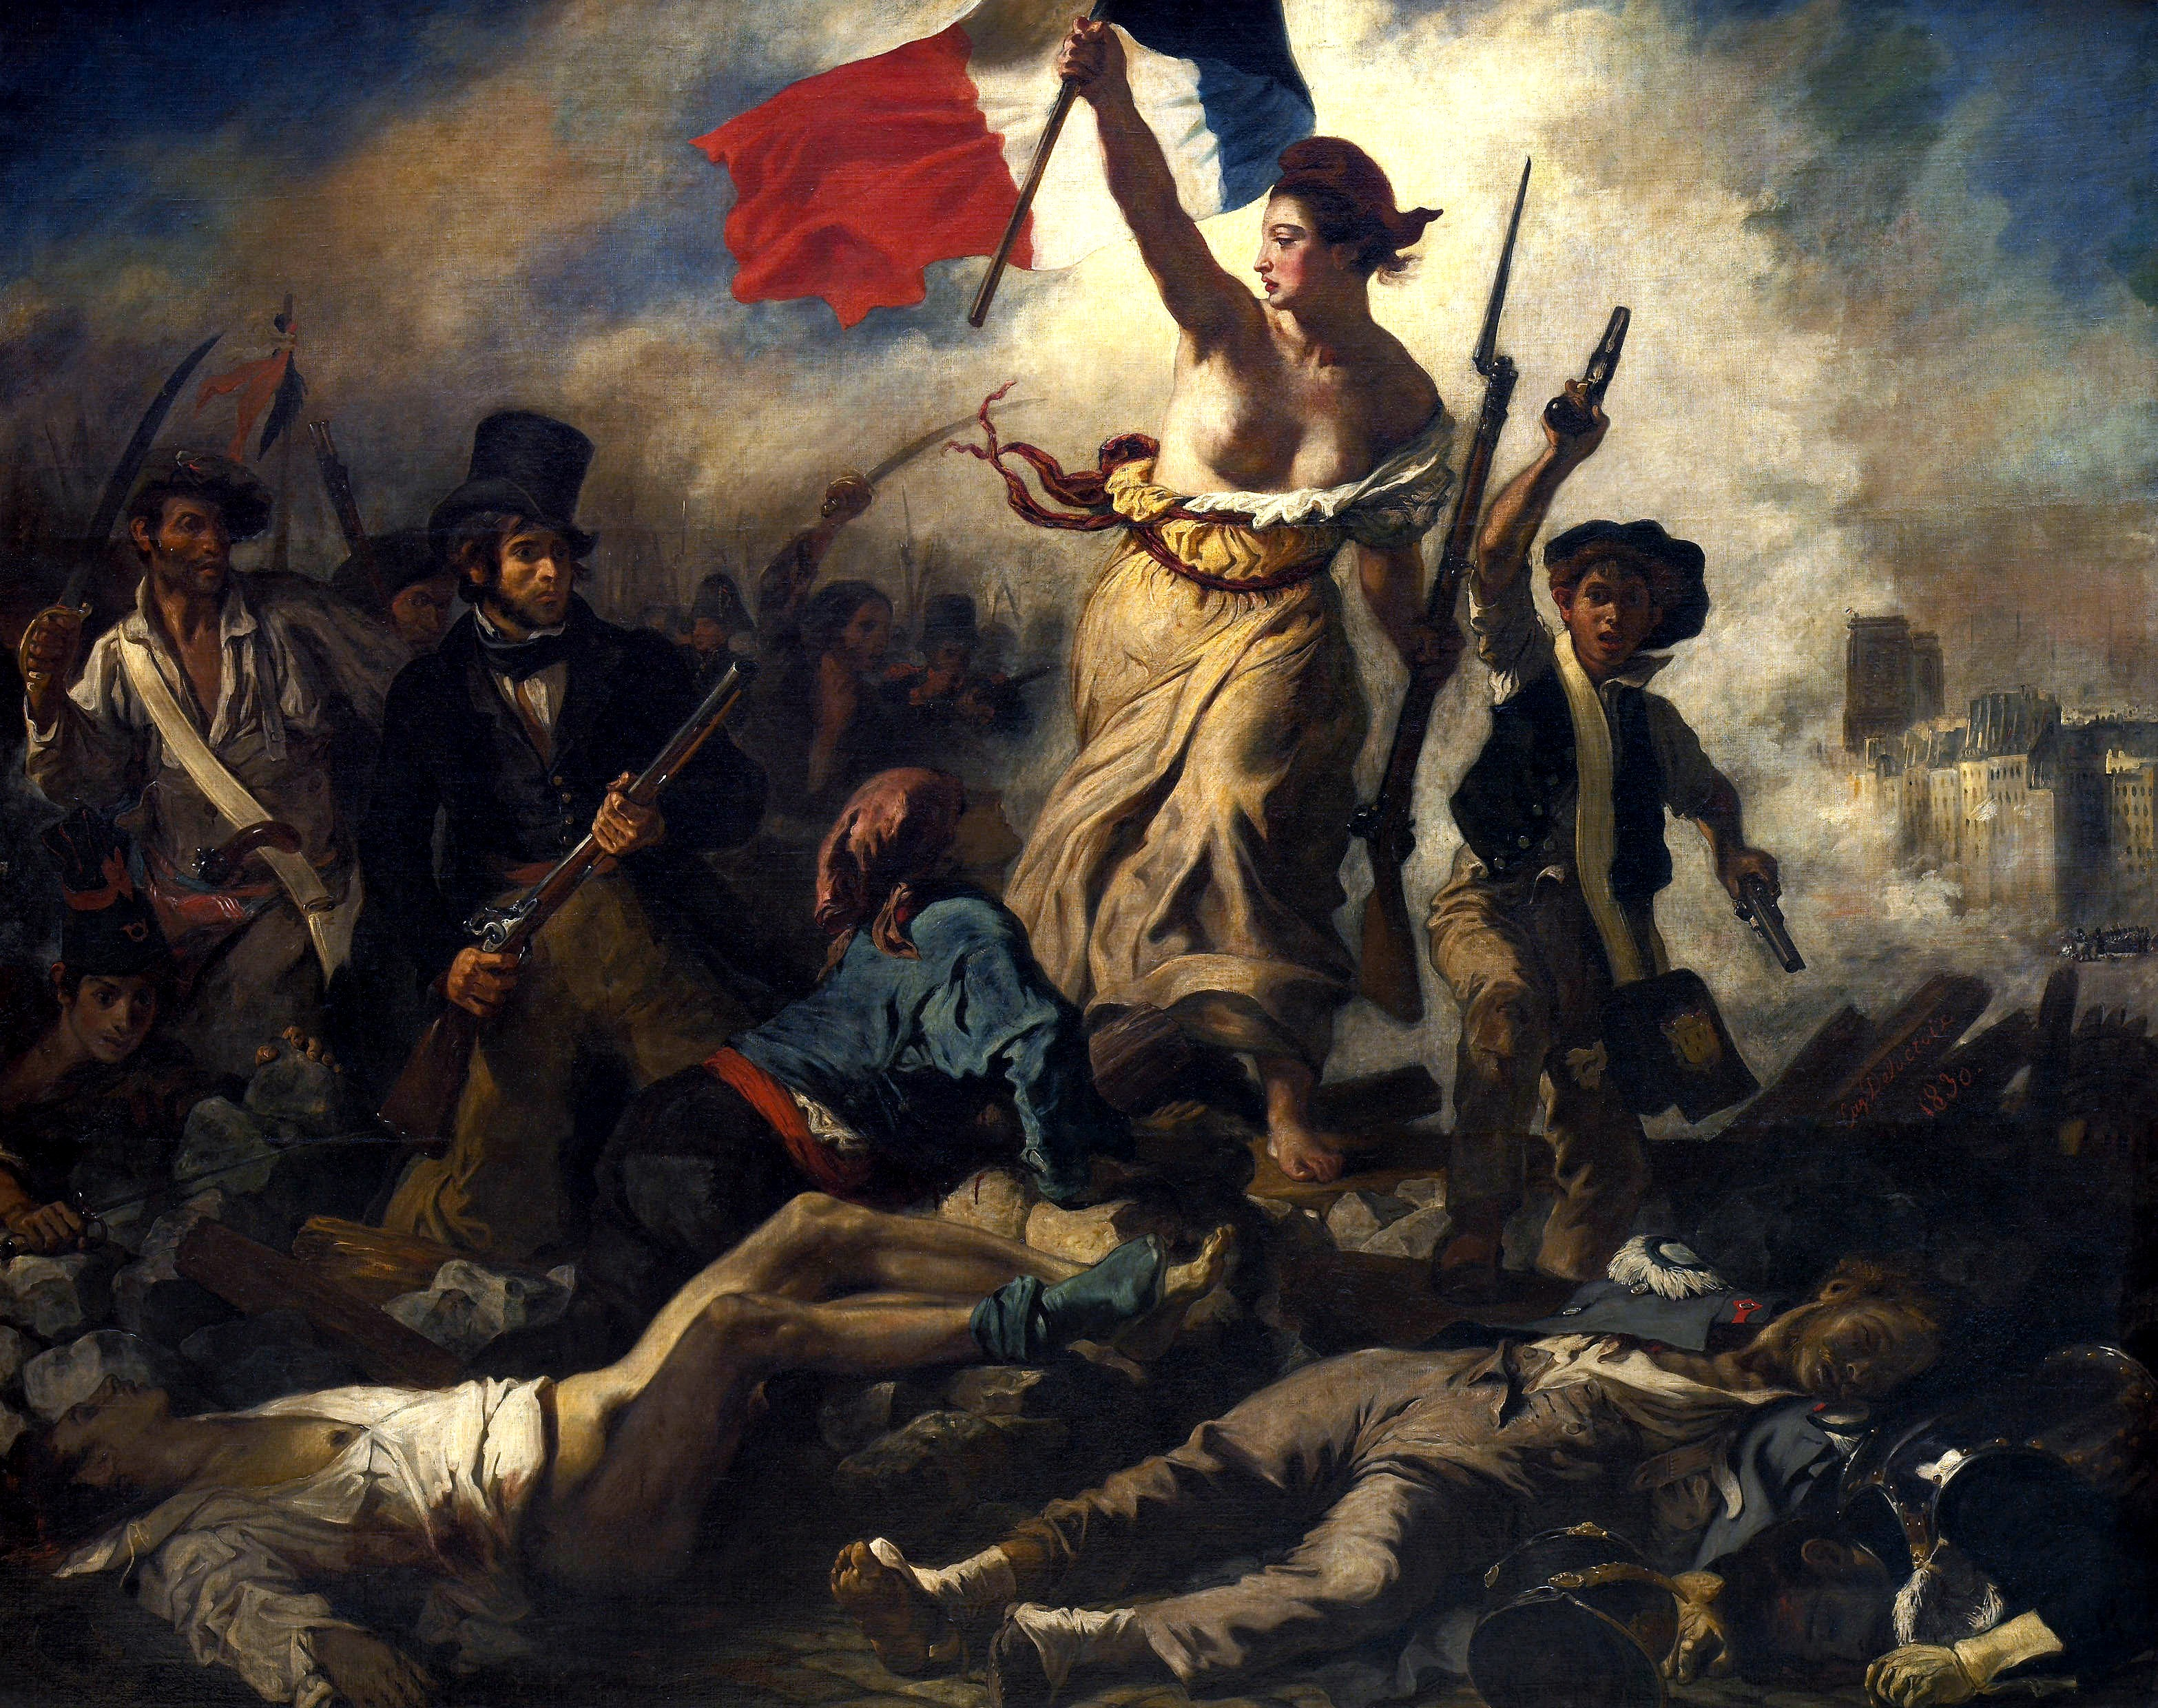 Delacroix - Liberty Leading the People